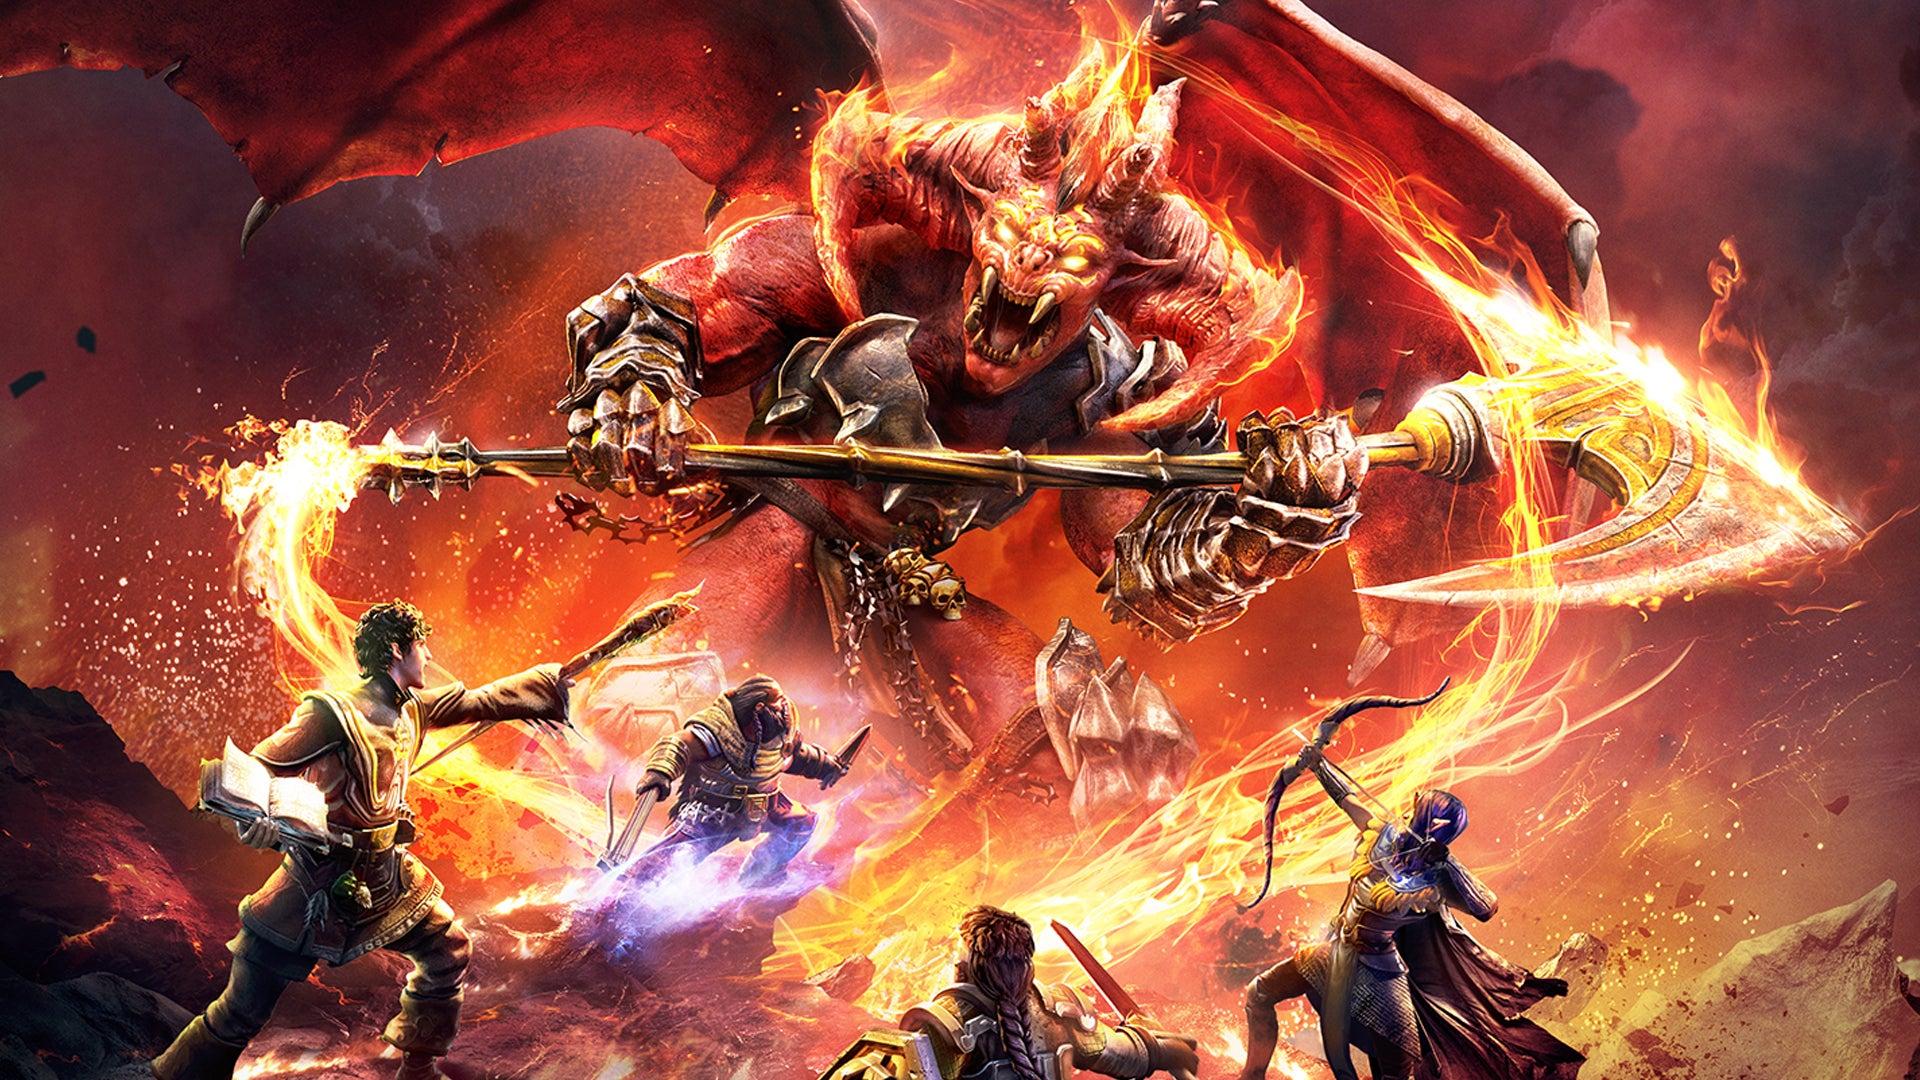 Dungeons & Dragons roleplaying game artwork 21